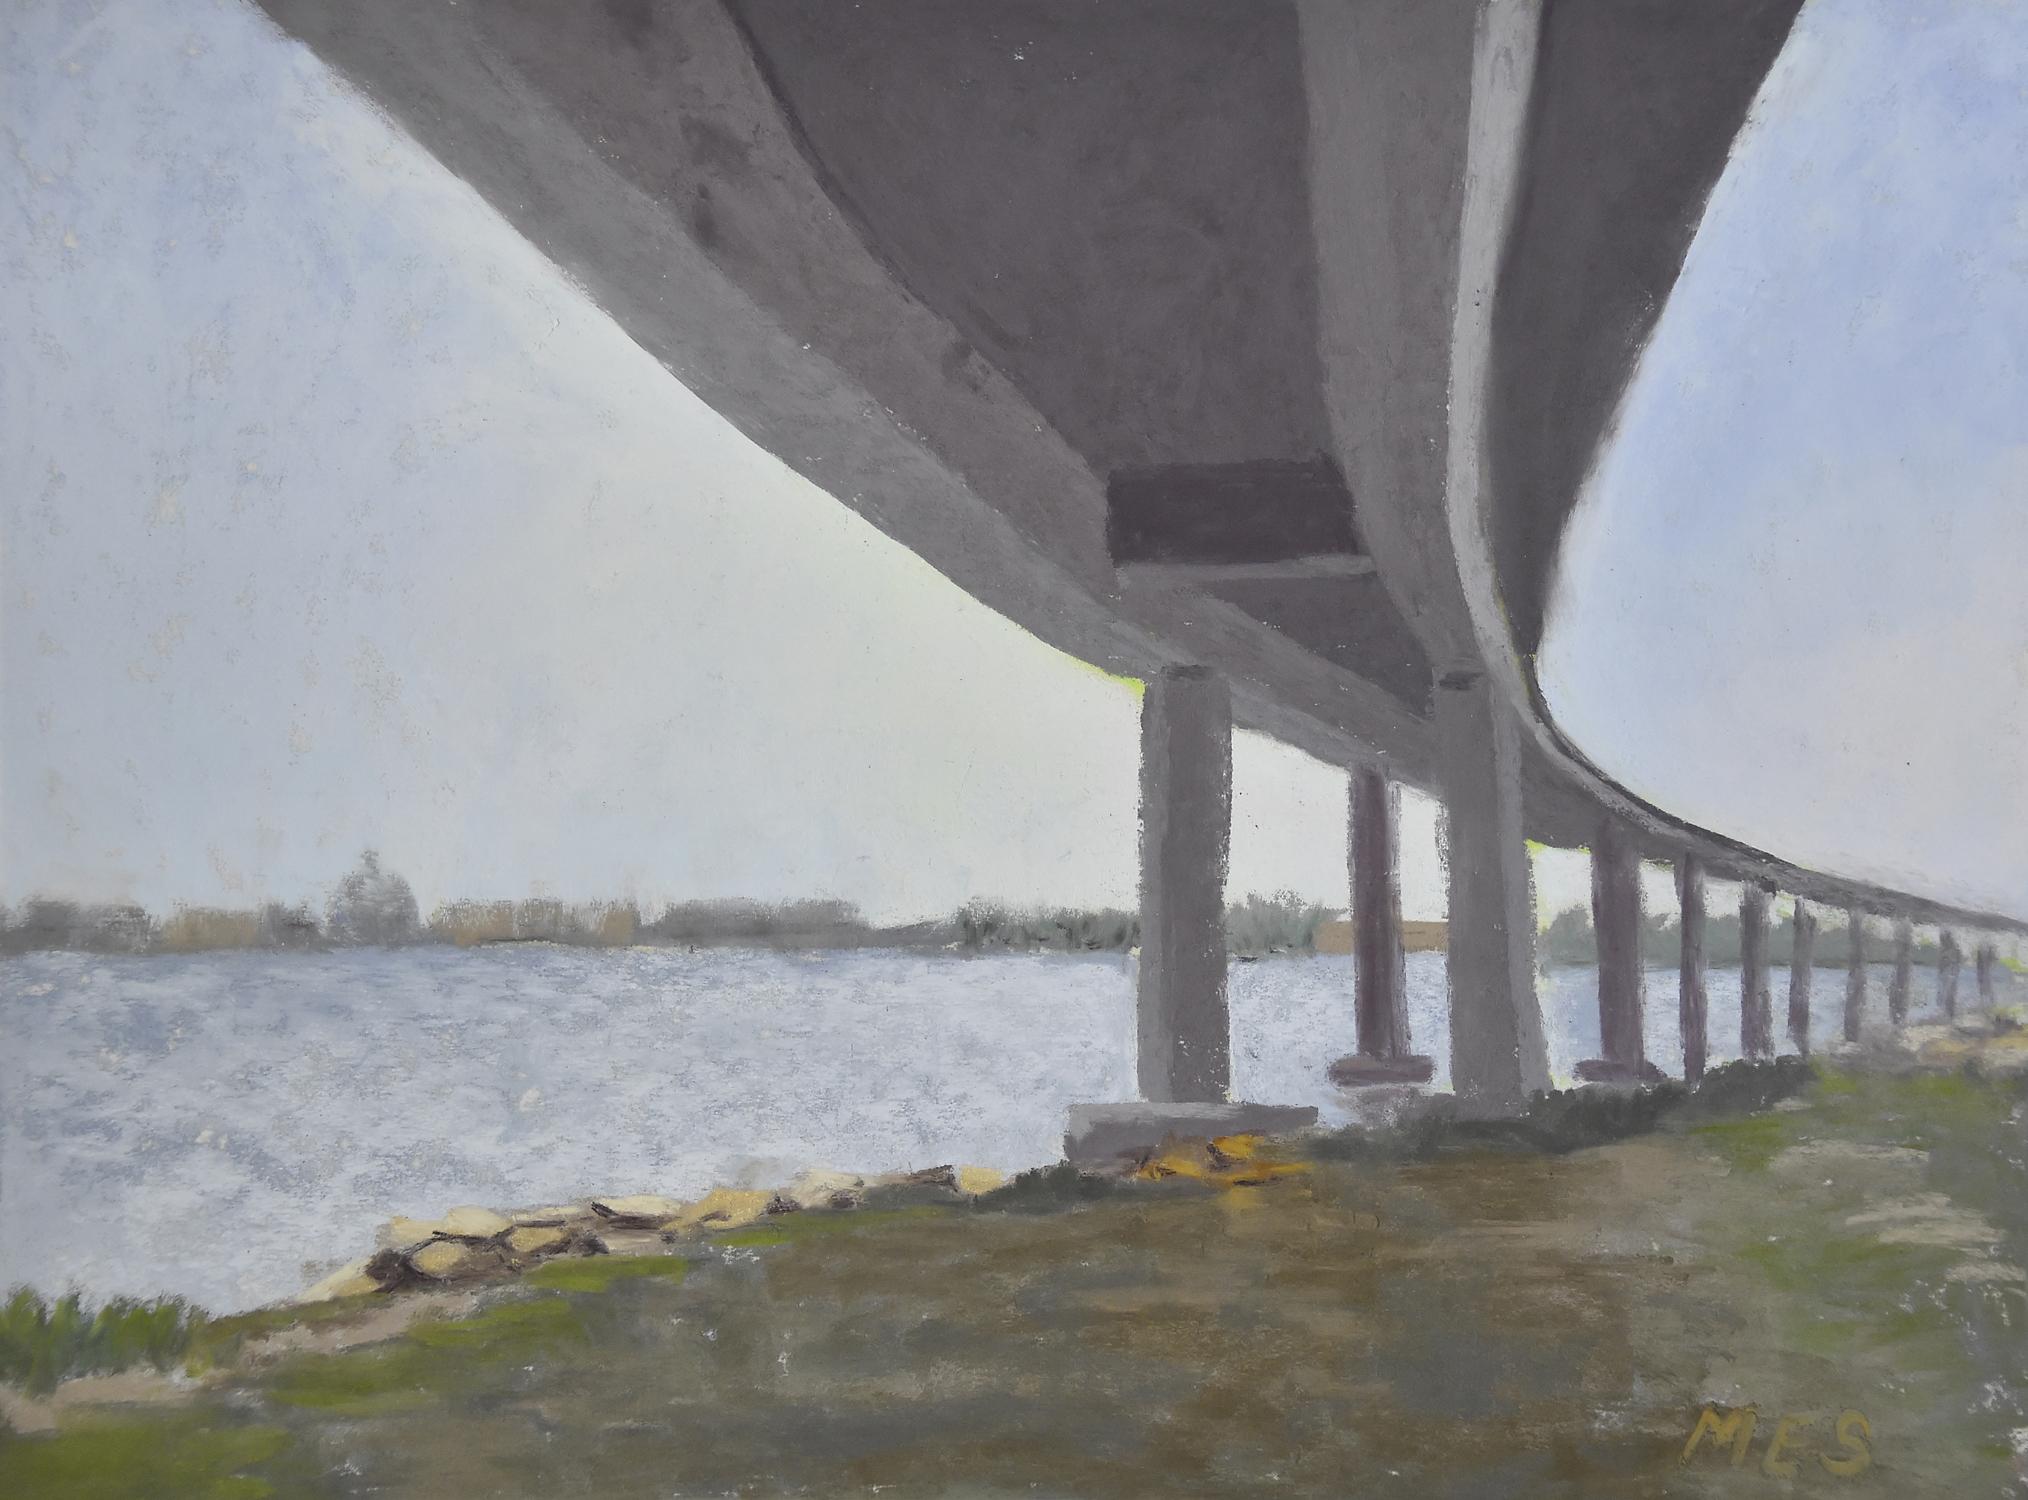 M.E. Simon, Under the Bridge, I